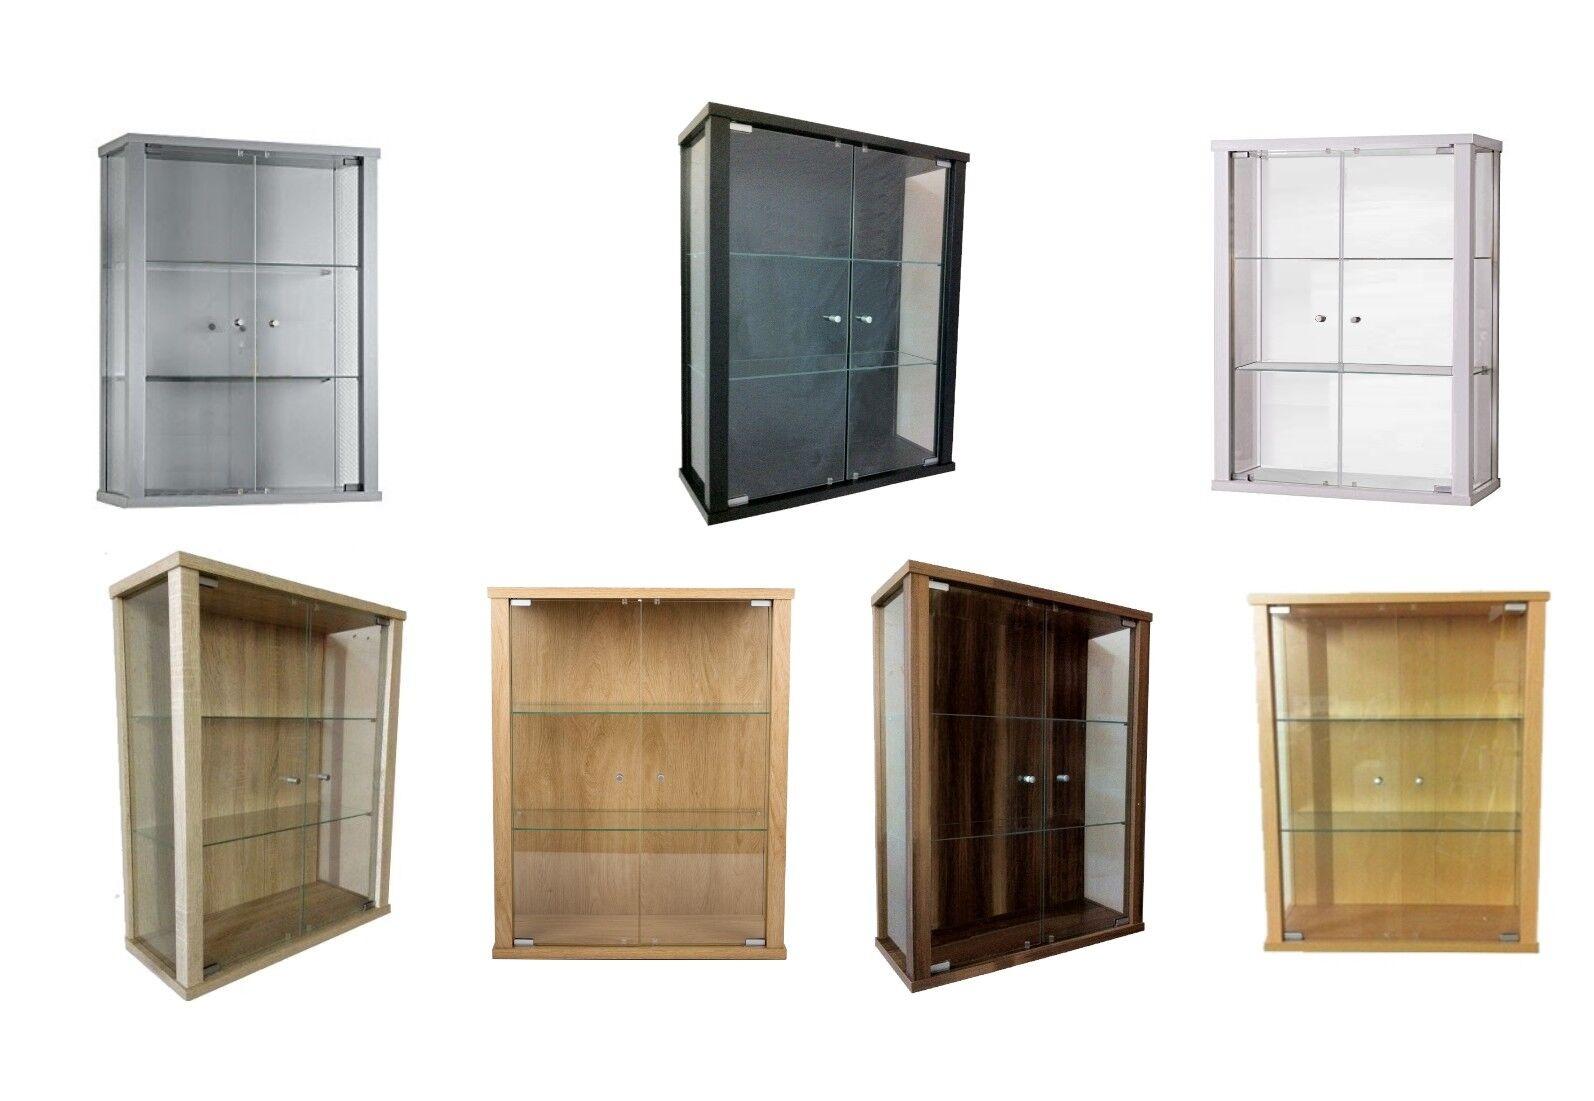 Glasvitrine │ 80x60x25 cm │Sammlervitrine 2 Glasböden Hängevitrine